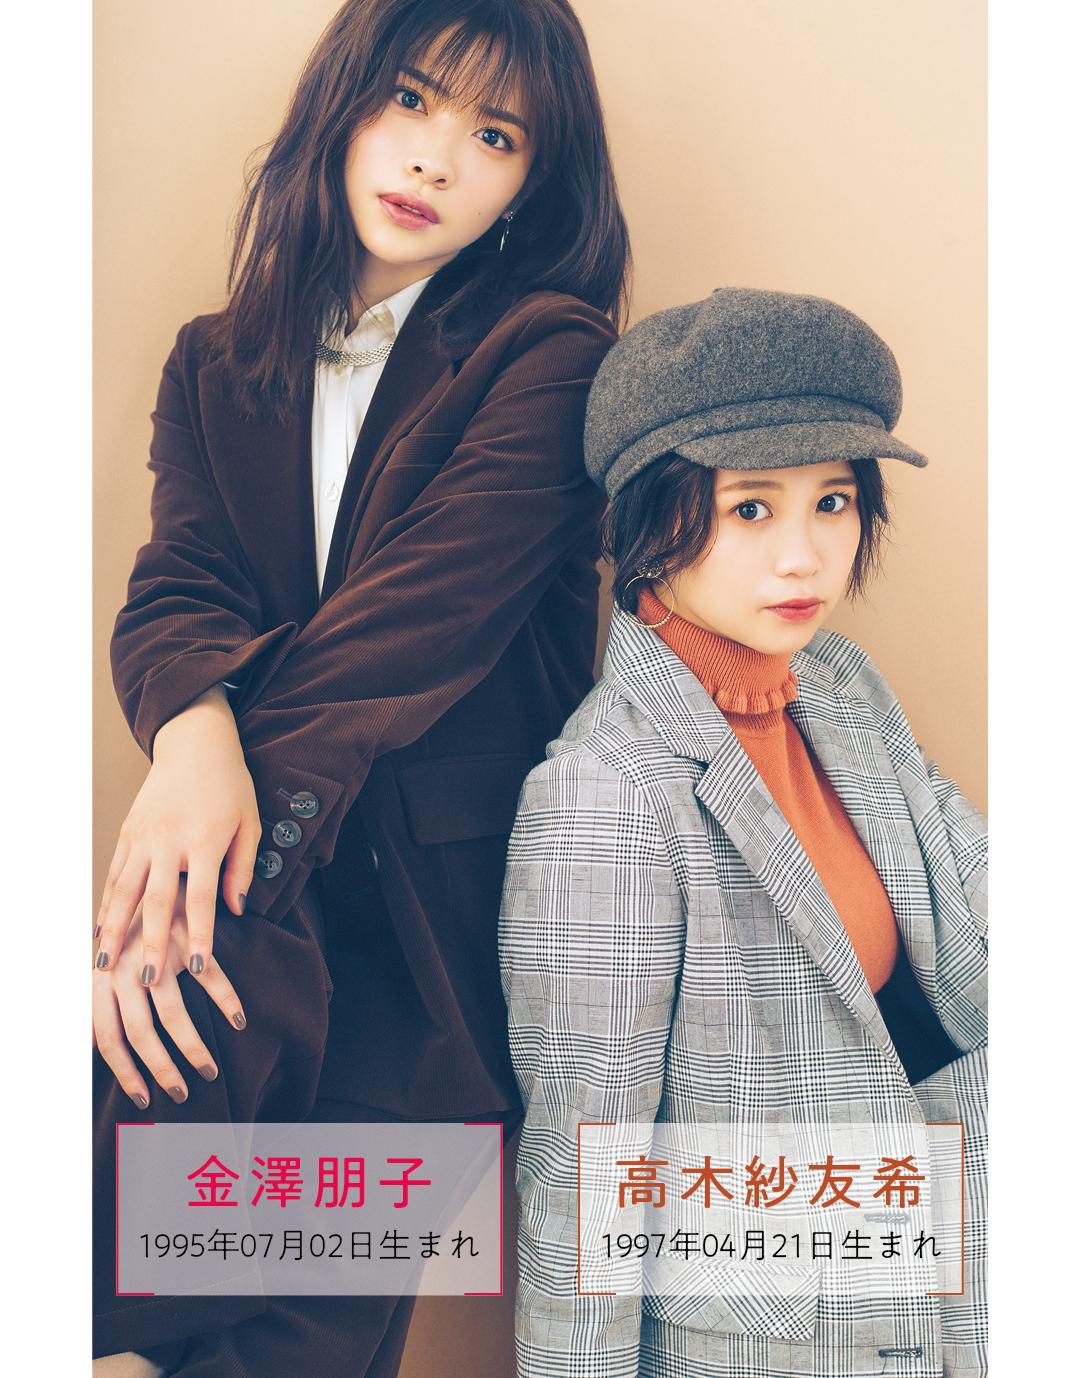 Juice=Juice(ジュースジュース)のガールズトークたっぷり♡ 新メンバーとの関係も!_1_3